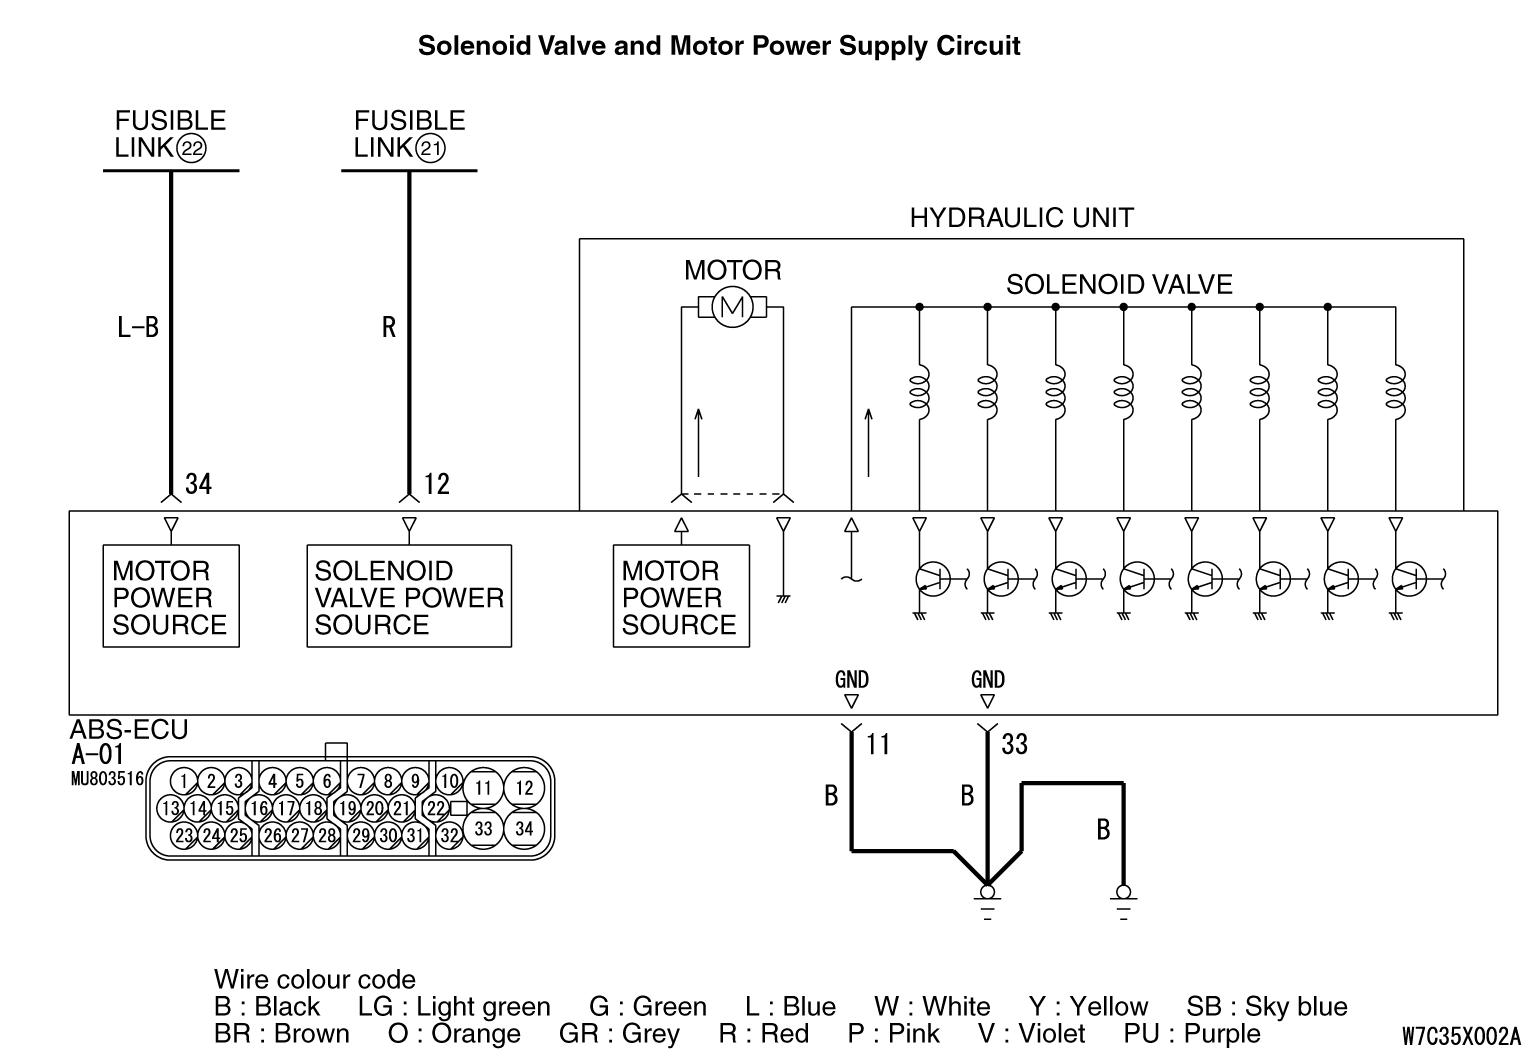 Code Noc1861 Abs Ecu Power Supply System Malfunction Low Voltage Manual Maintenance Electrical Wiring Diagrams Mmc Body Repair C1861